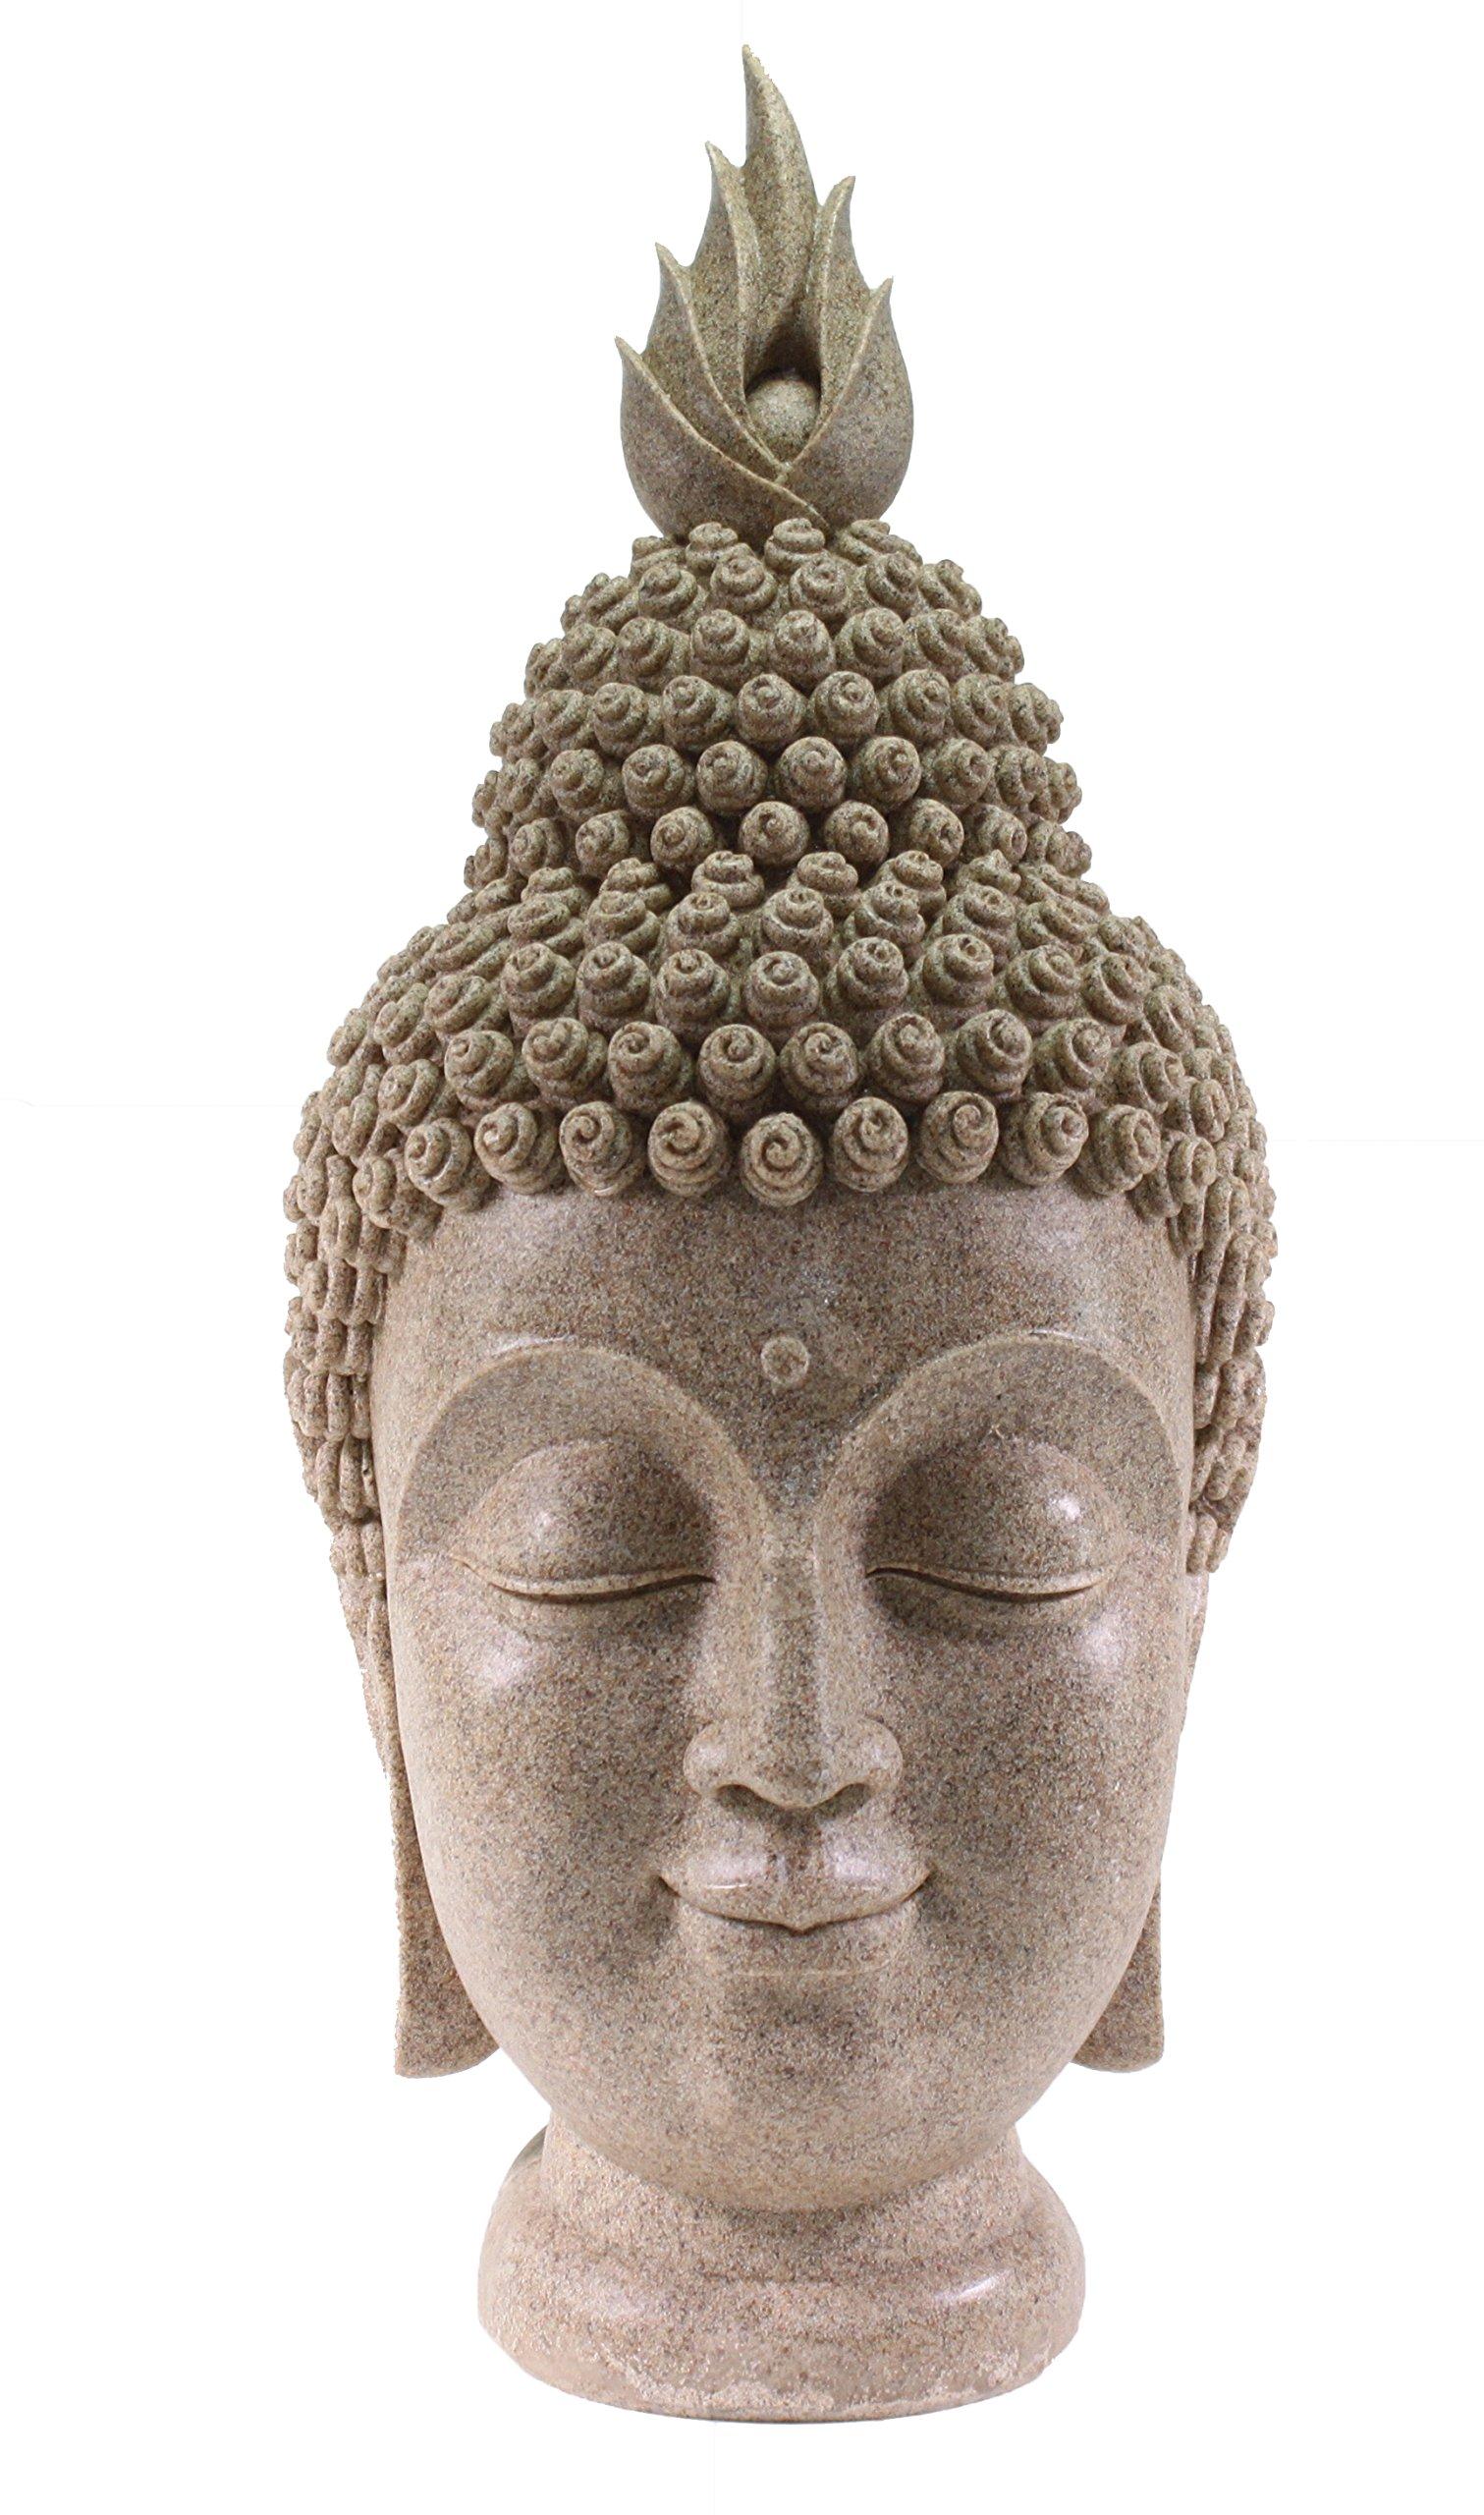 Smiling Meditating Buddha Shakyamuni Head Statue Large 15'' Tall Blessing Mercy & Love